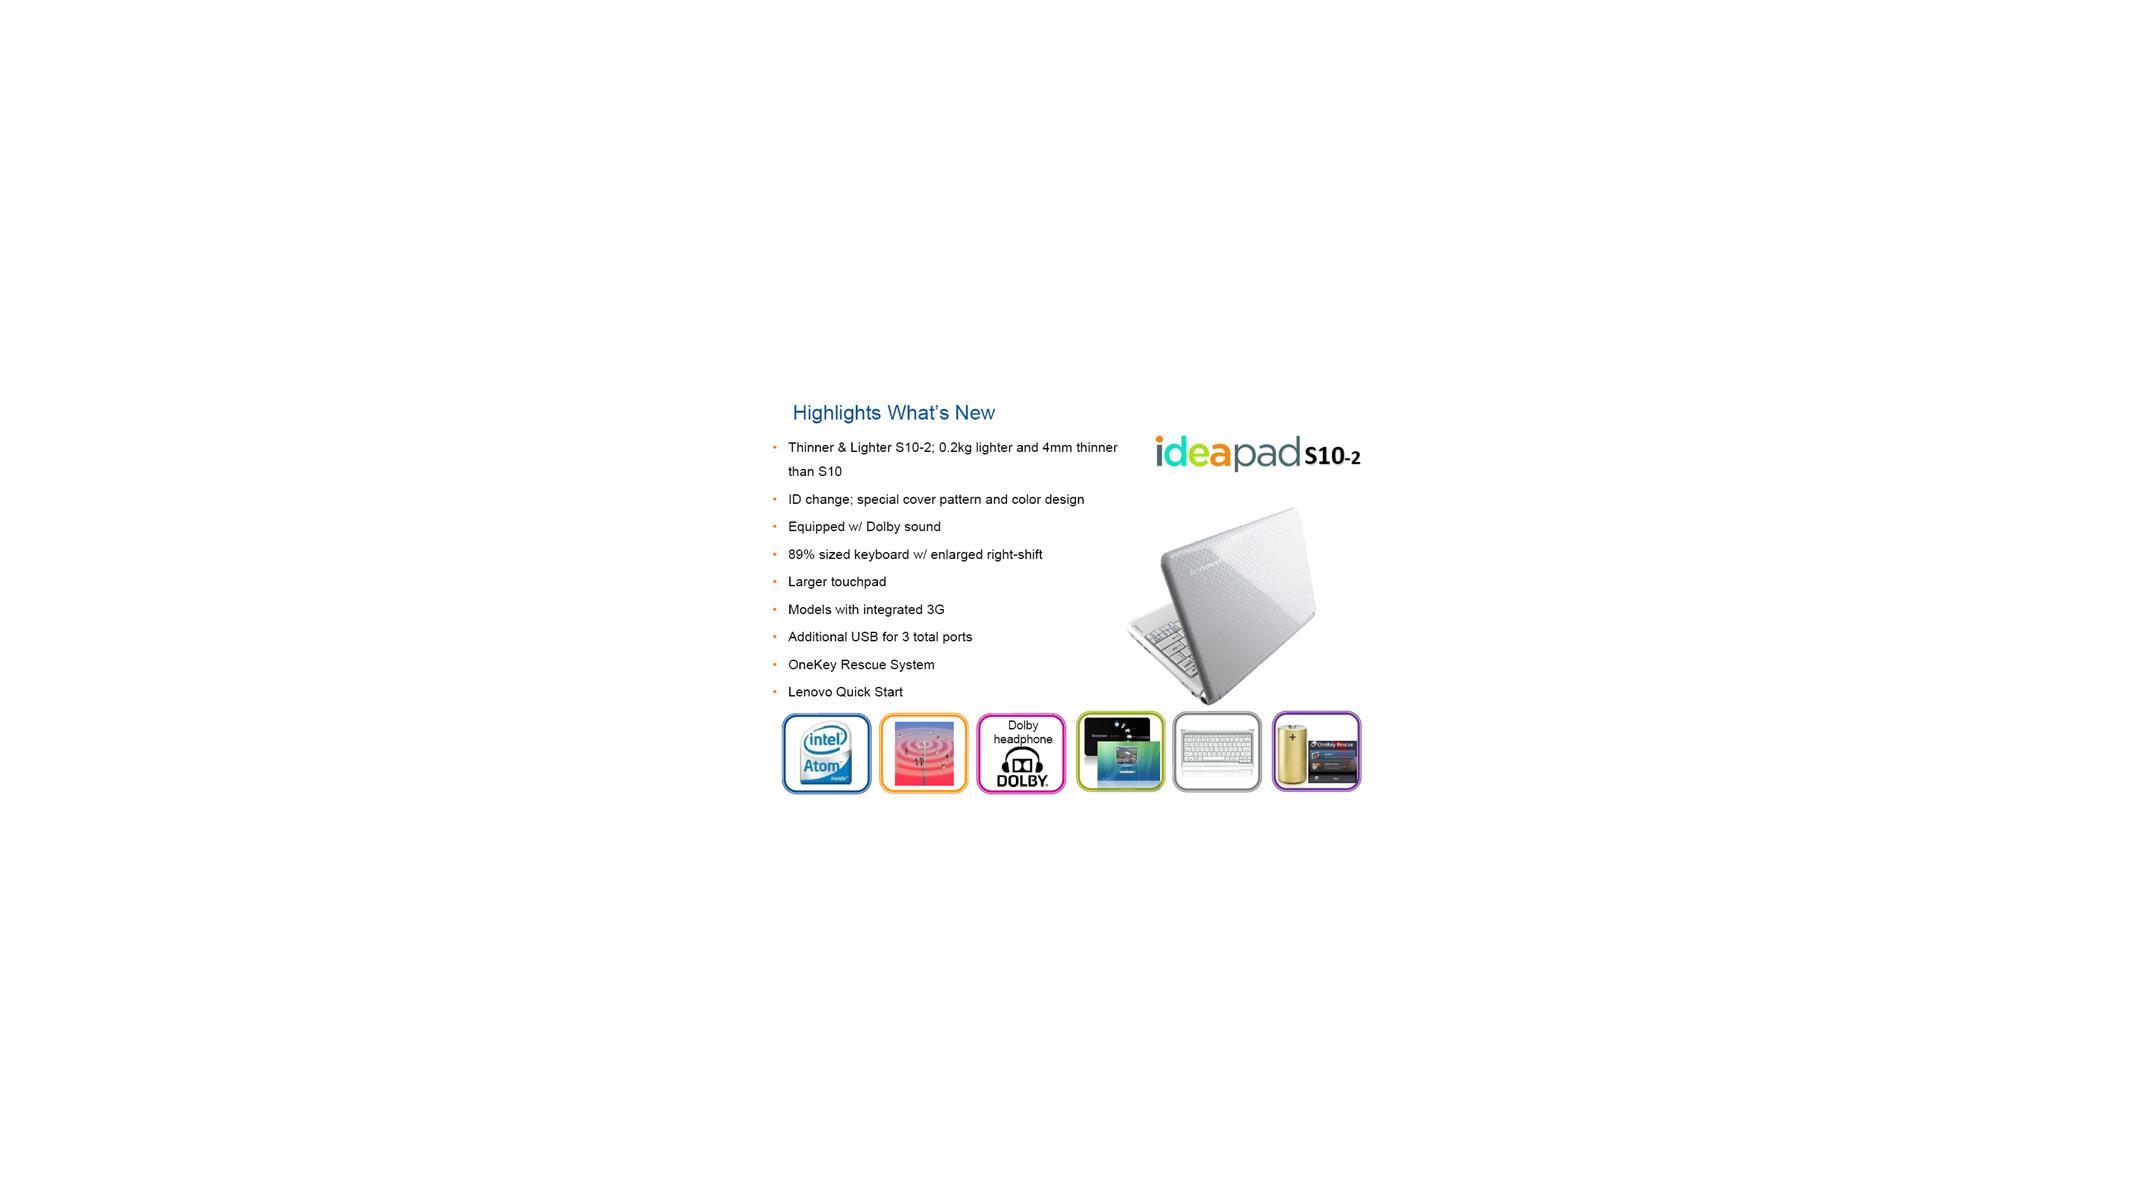 Lenovo Debuts Tweaked IdeaPad S10-2 Netbook | HotHardware